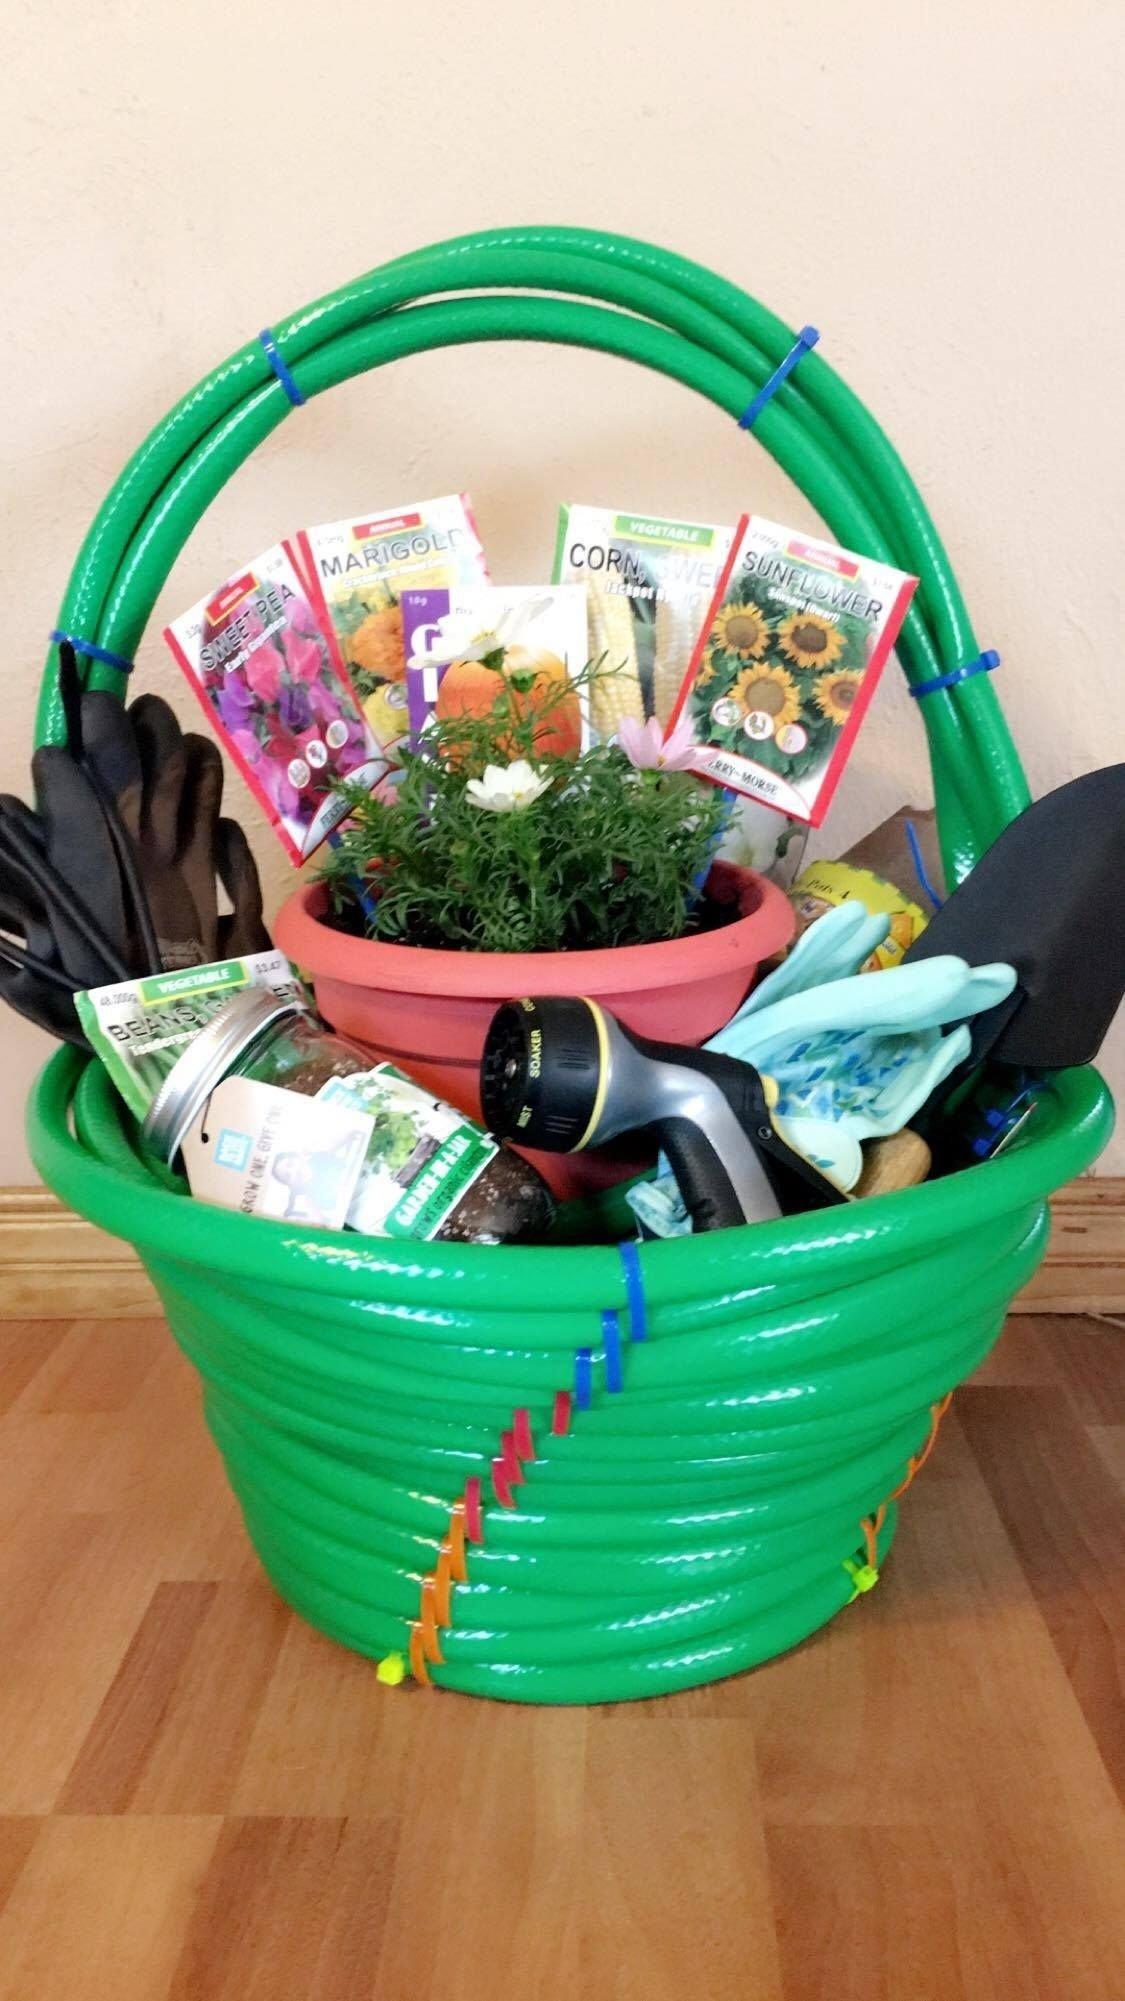 10 Cute Theme Basket Ideas For Silent Auction garden themed silent auction basket themed gift baskets 2021